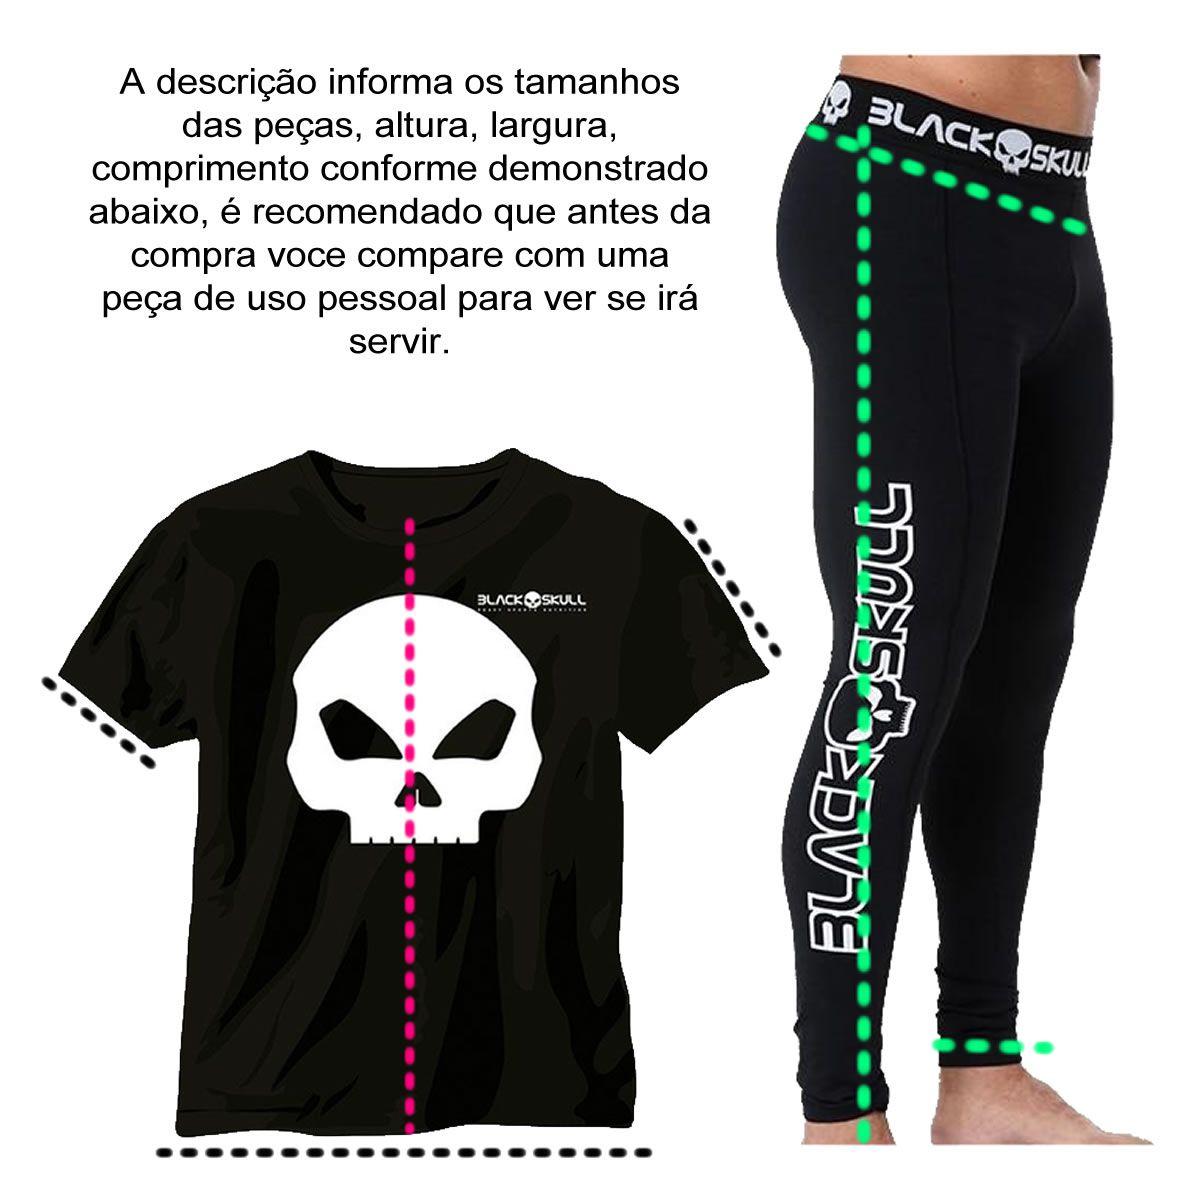 Camiseta Rust Preto - Black Skull